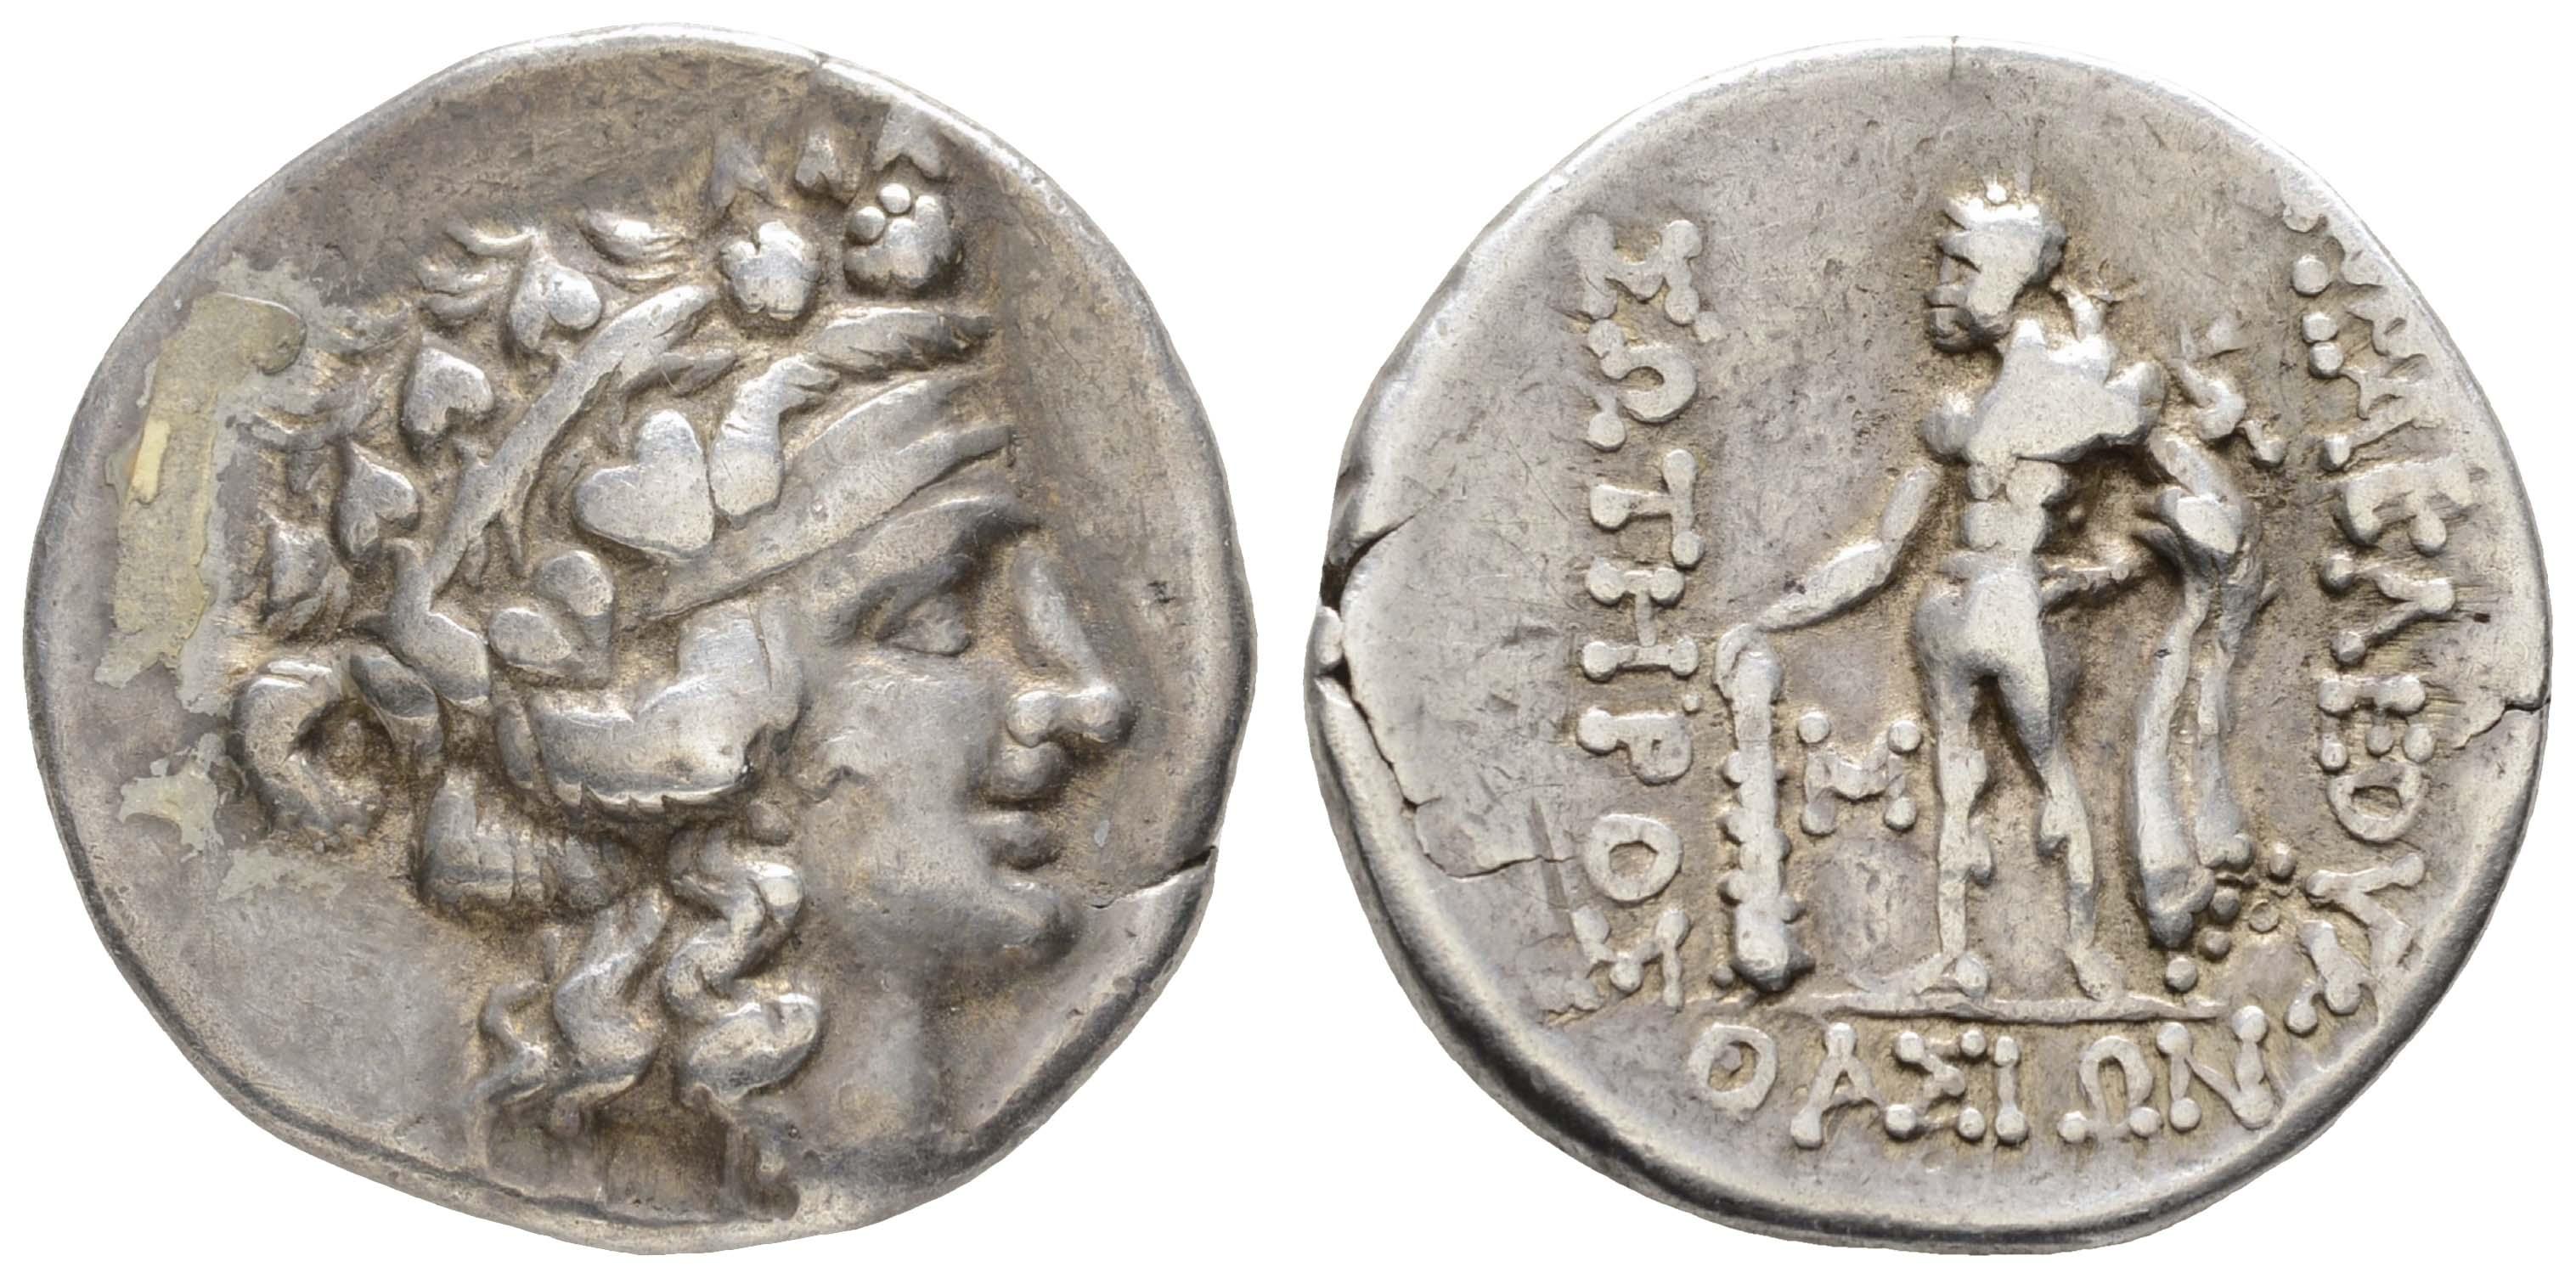 Lot 20 - Antike Griechen Thracia  -  Auktionshaus Ulrich Felzmann GmbH & Co. KG Auction 169